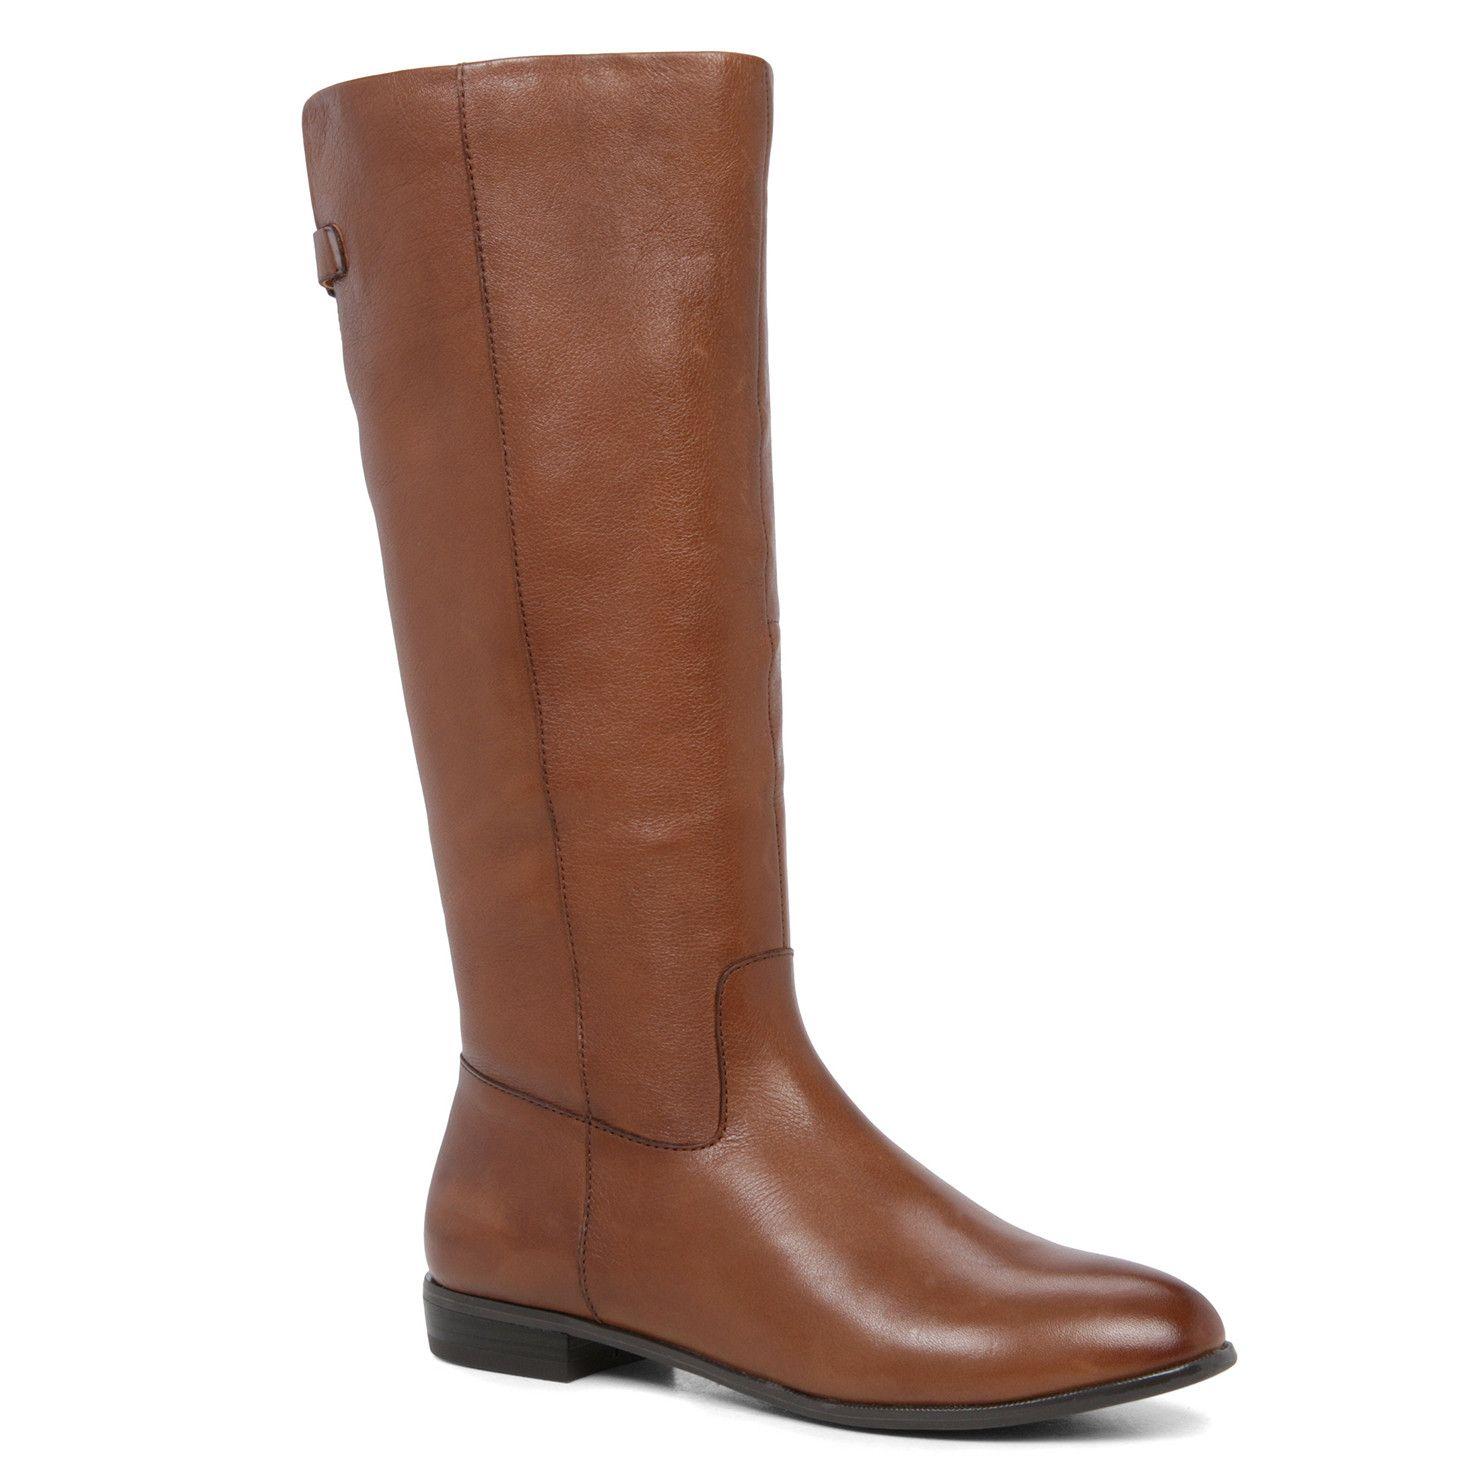 9e5c8a83d Mihaela Black Multi Women s Boots